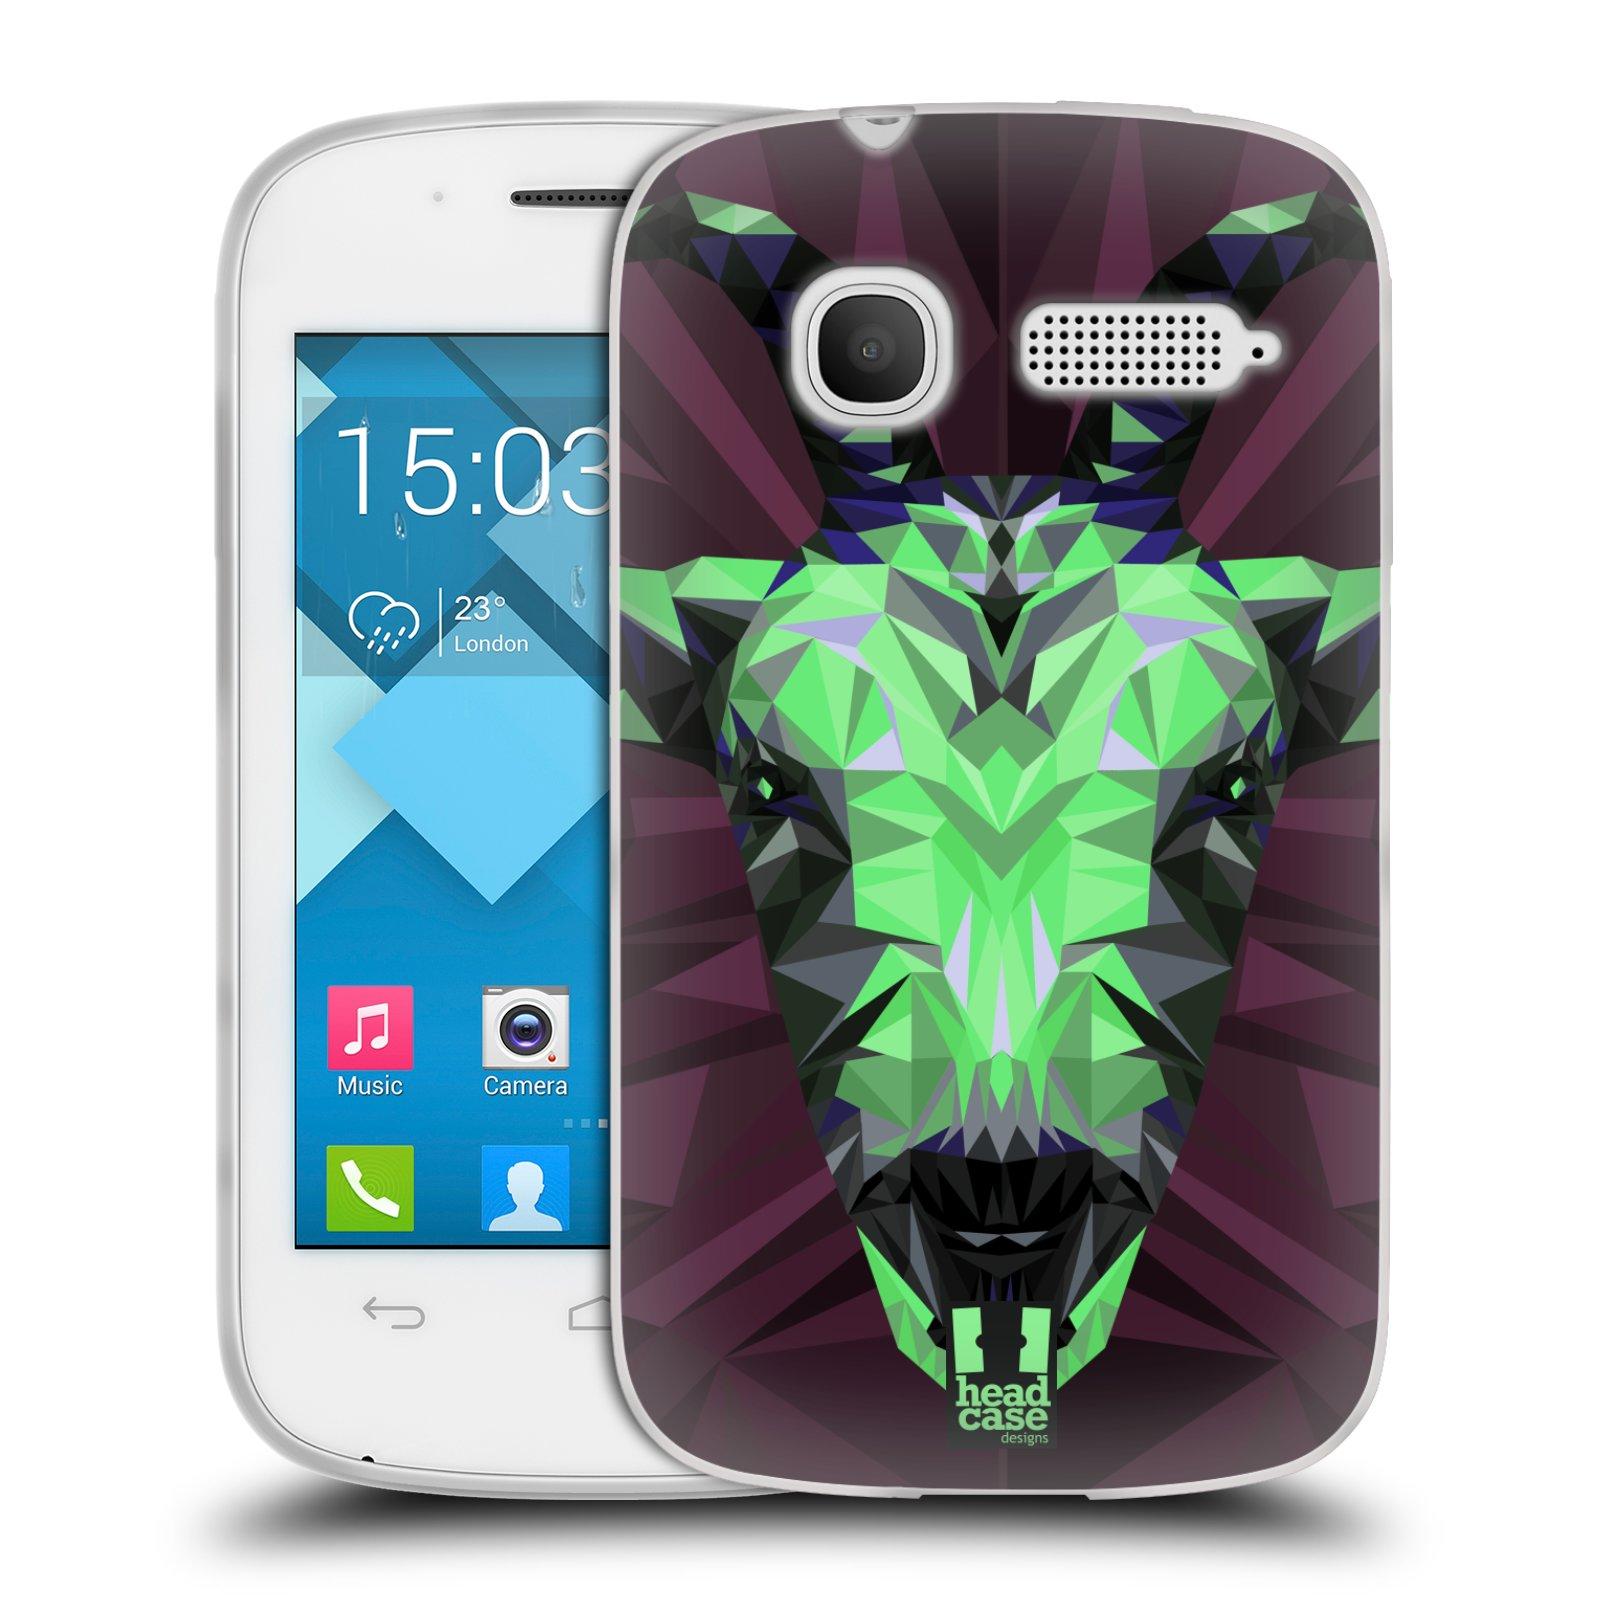 HEAD CASE silikonový obal na mobil Alcatel POP C1 OT-4015D vzor Geometrická zvířata 2 kozel